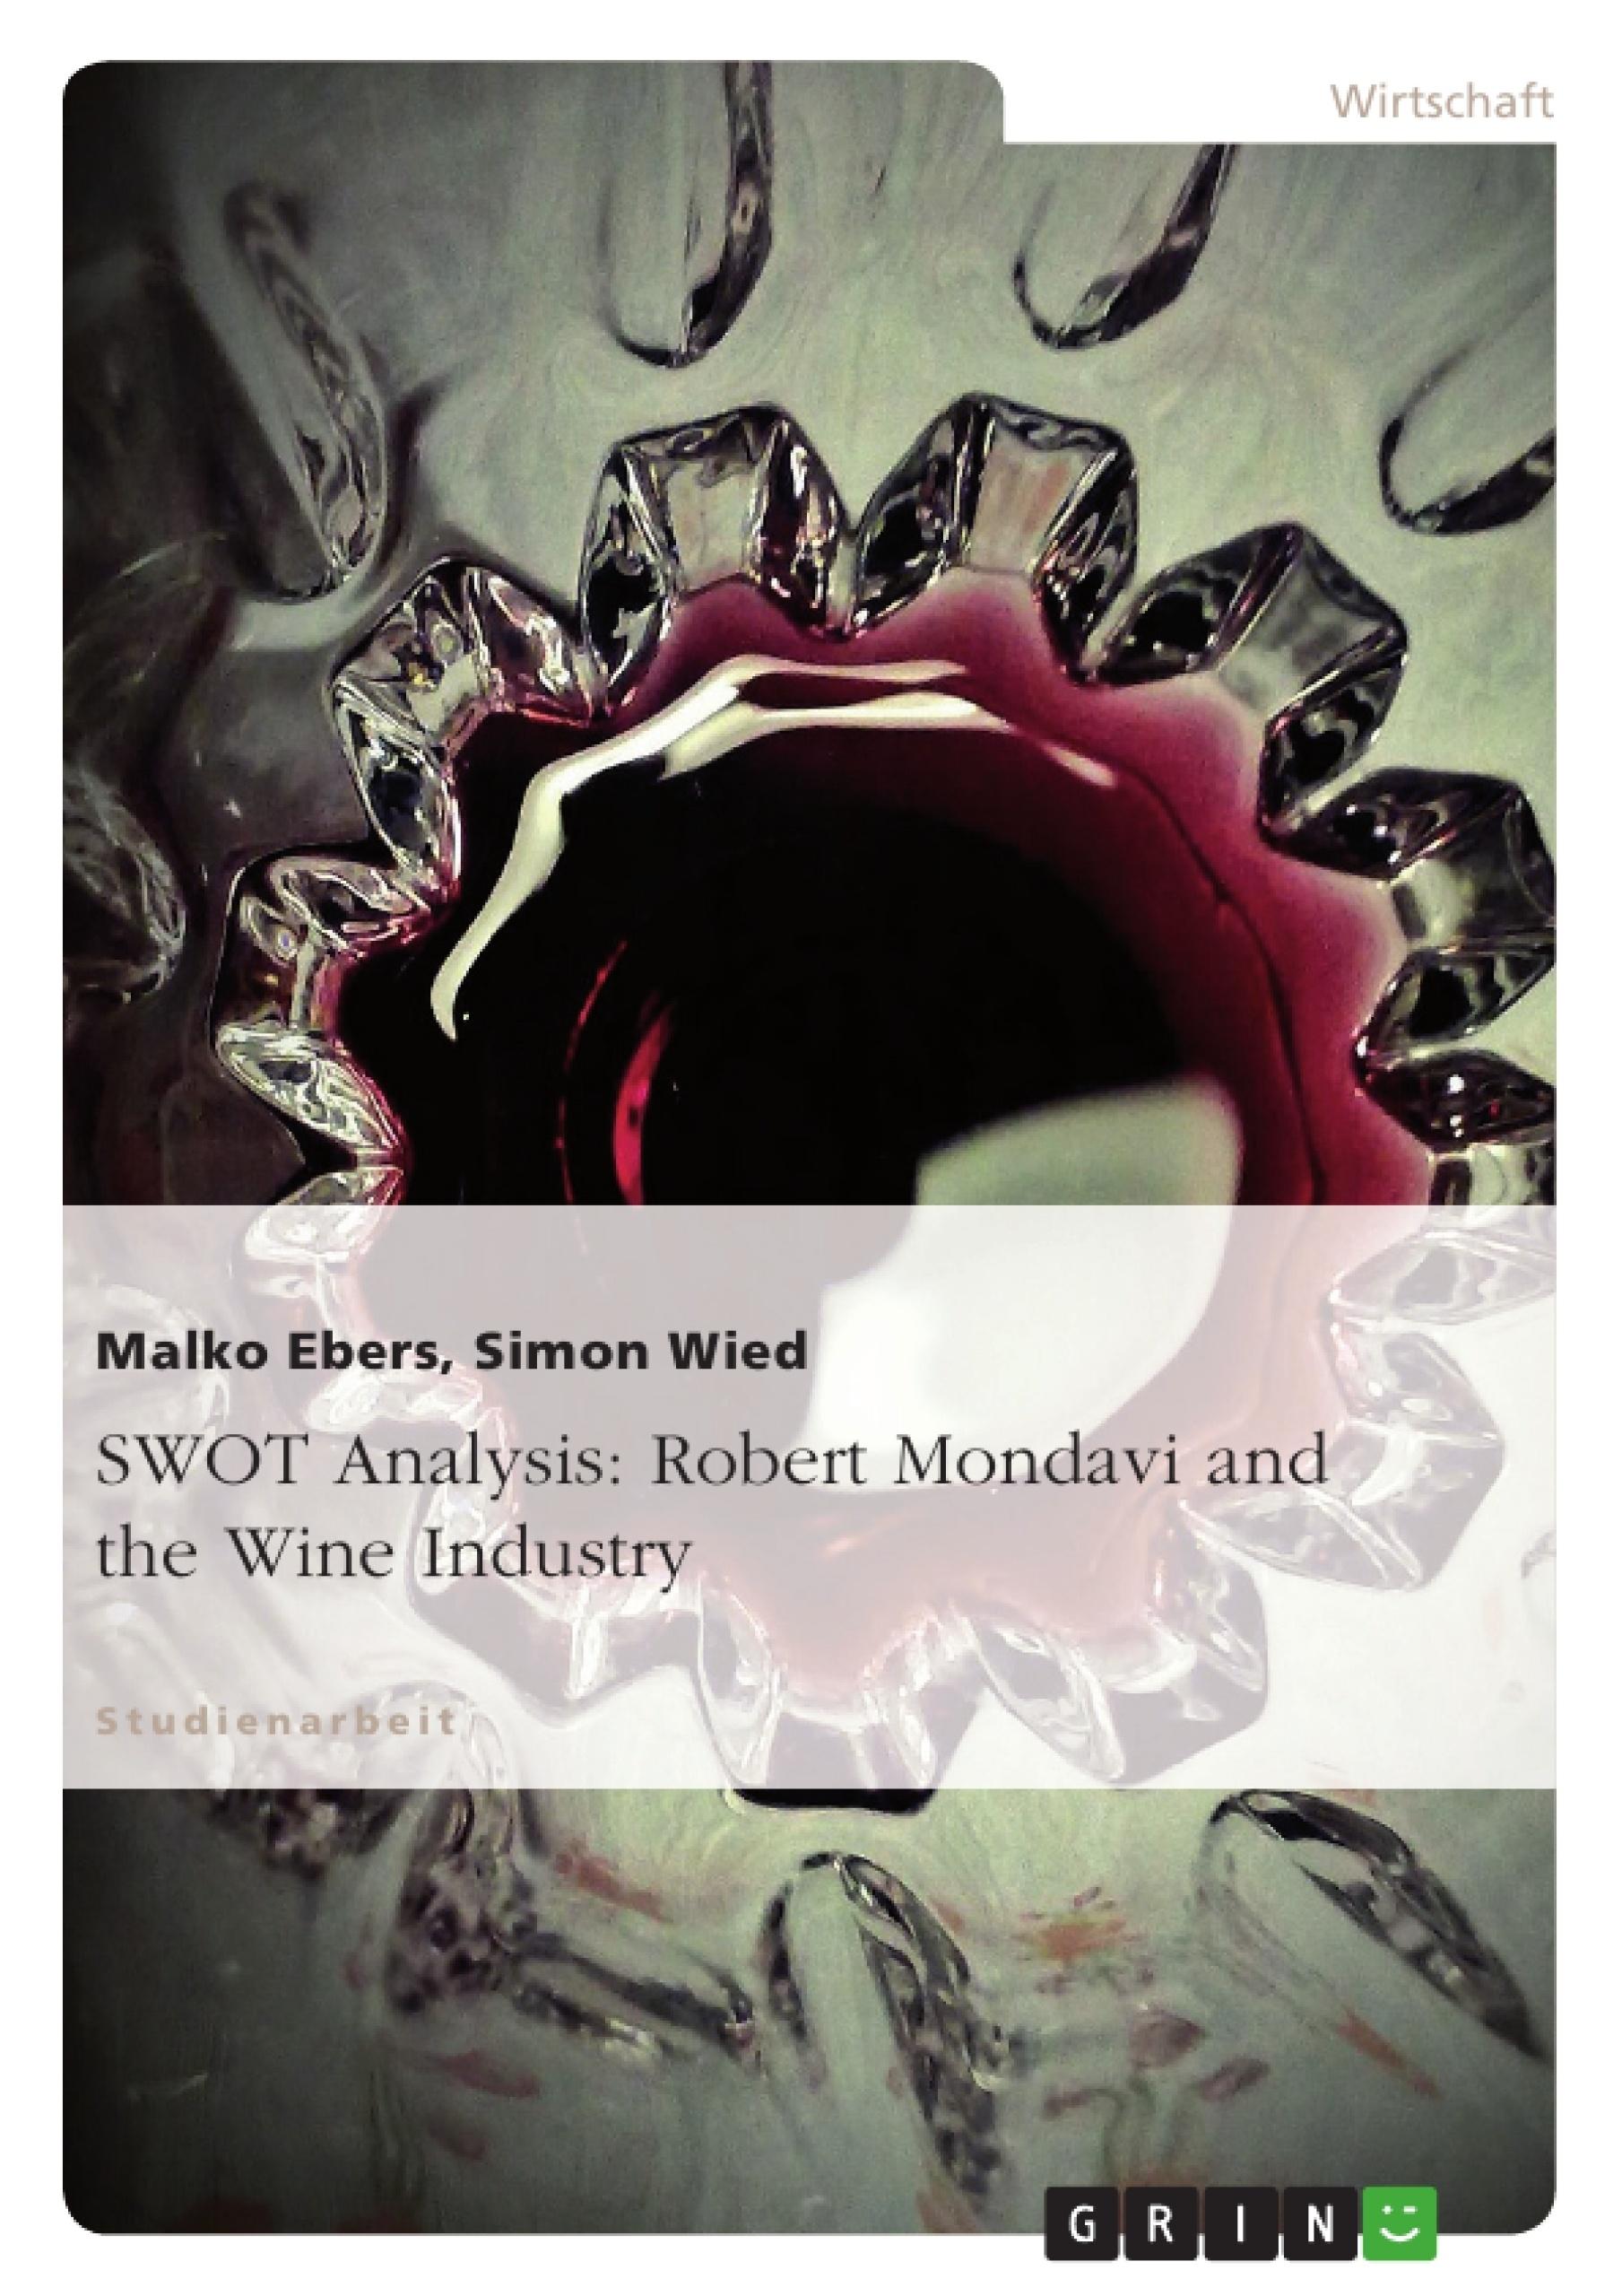 robert mondavi the wine industry case five forces Analysis & implications of porter's five competitive  robert mondavi and the wine industry case  more about essay on strategic analysis of robert mondavi.